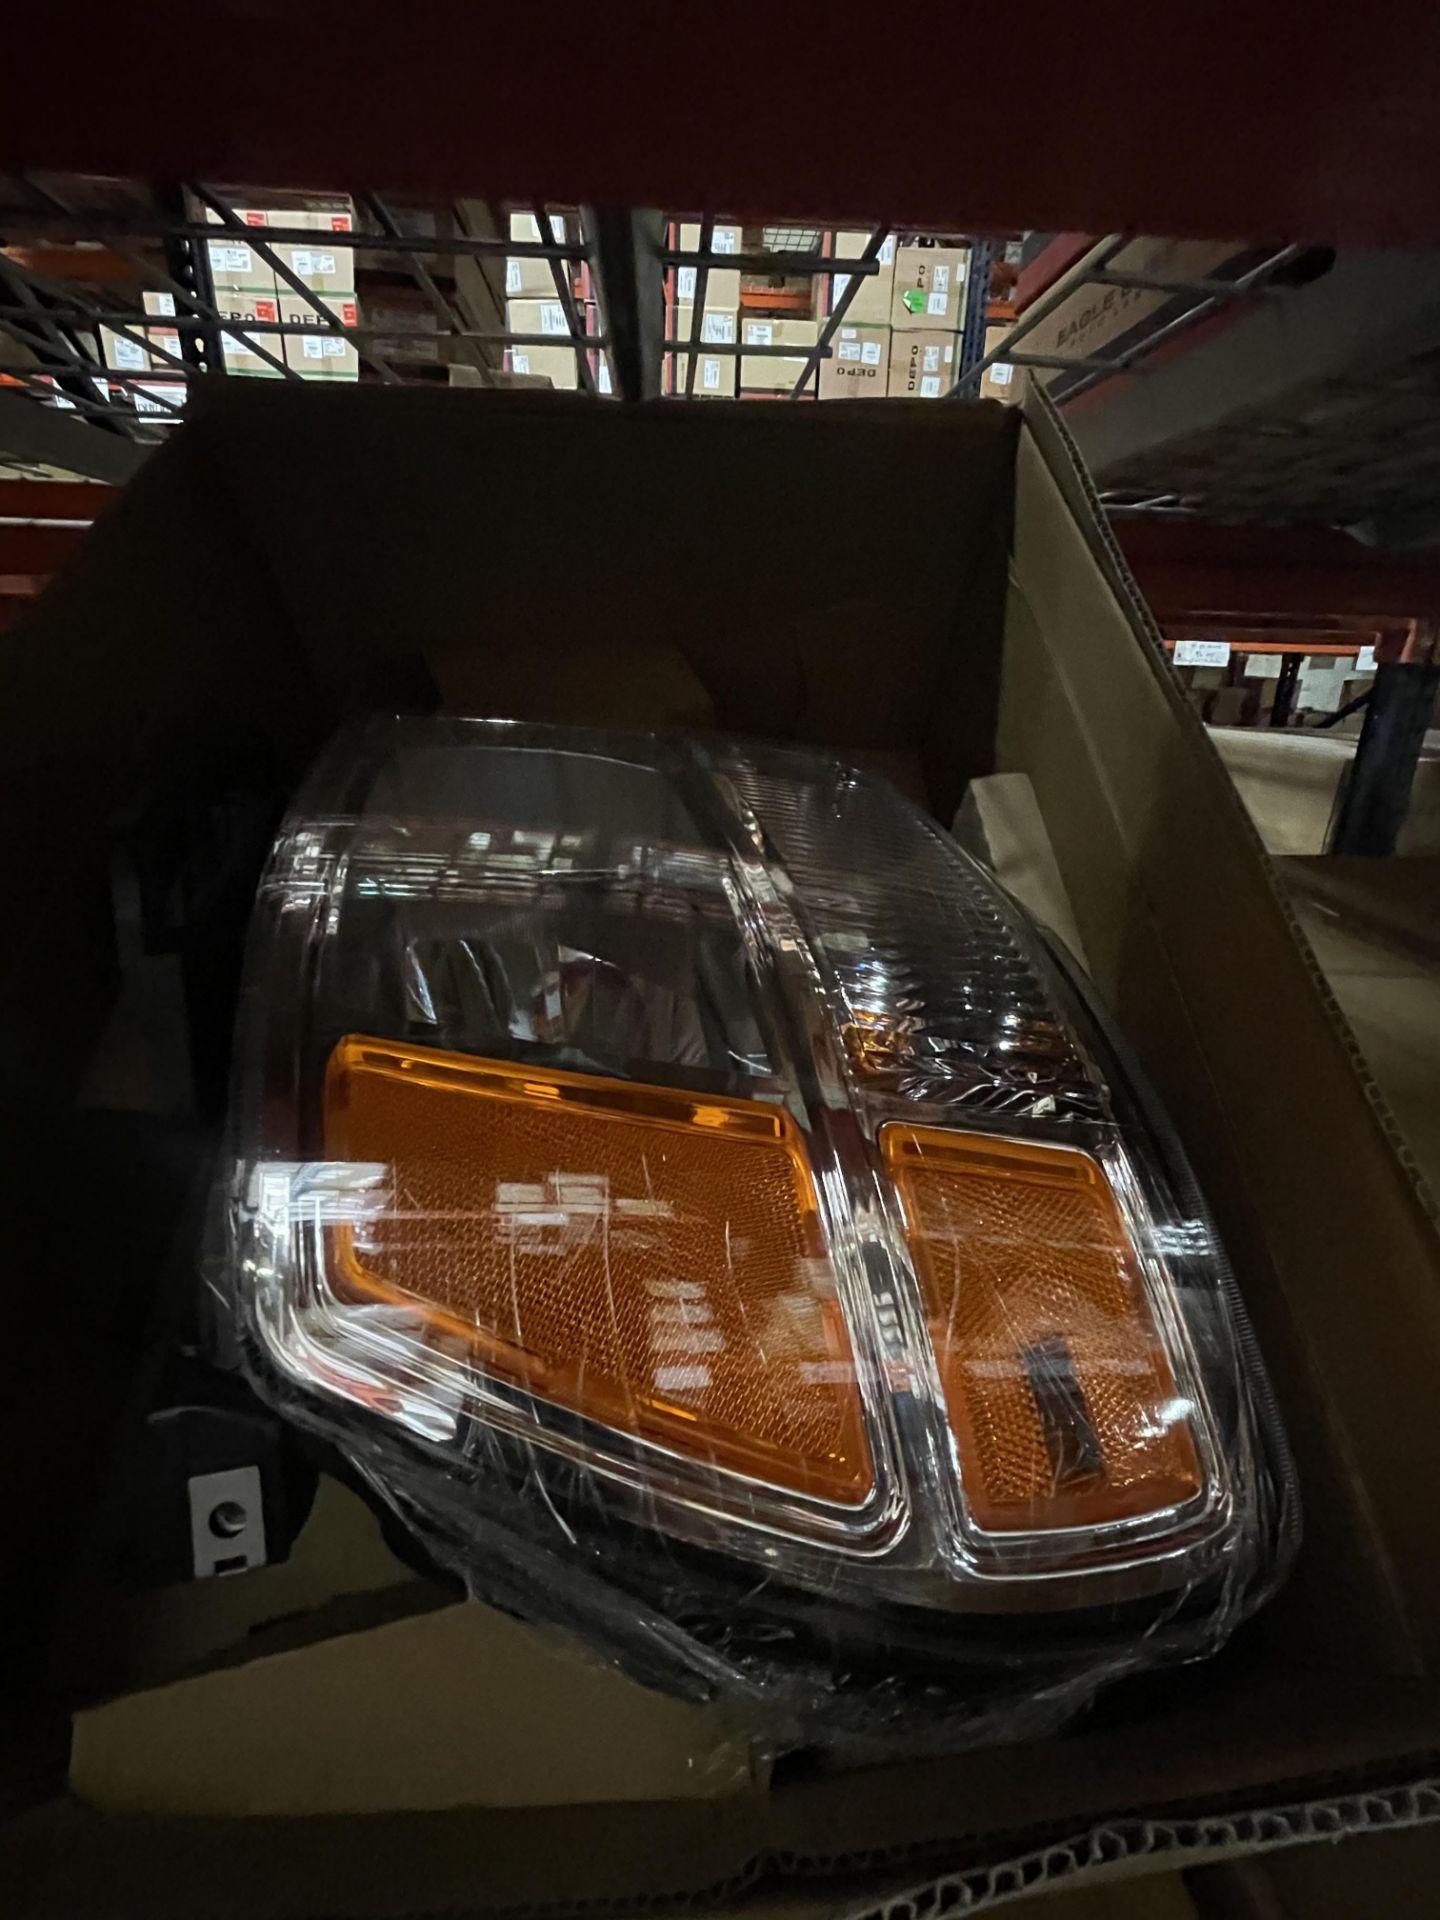 ASST EAGLE TYC AUTO LAMPS PATHFINDER ARMADA 46X - Image 2 of 3